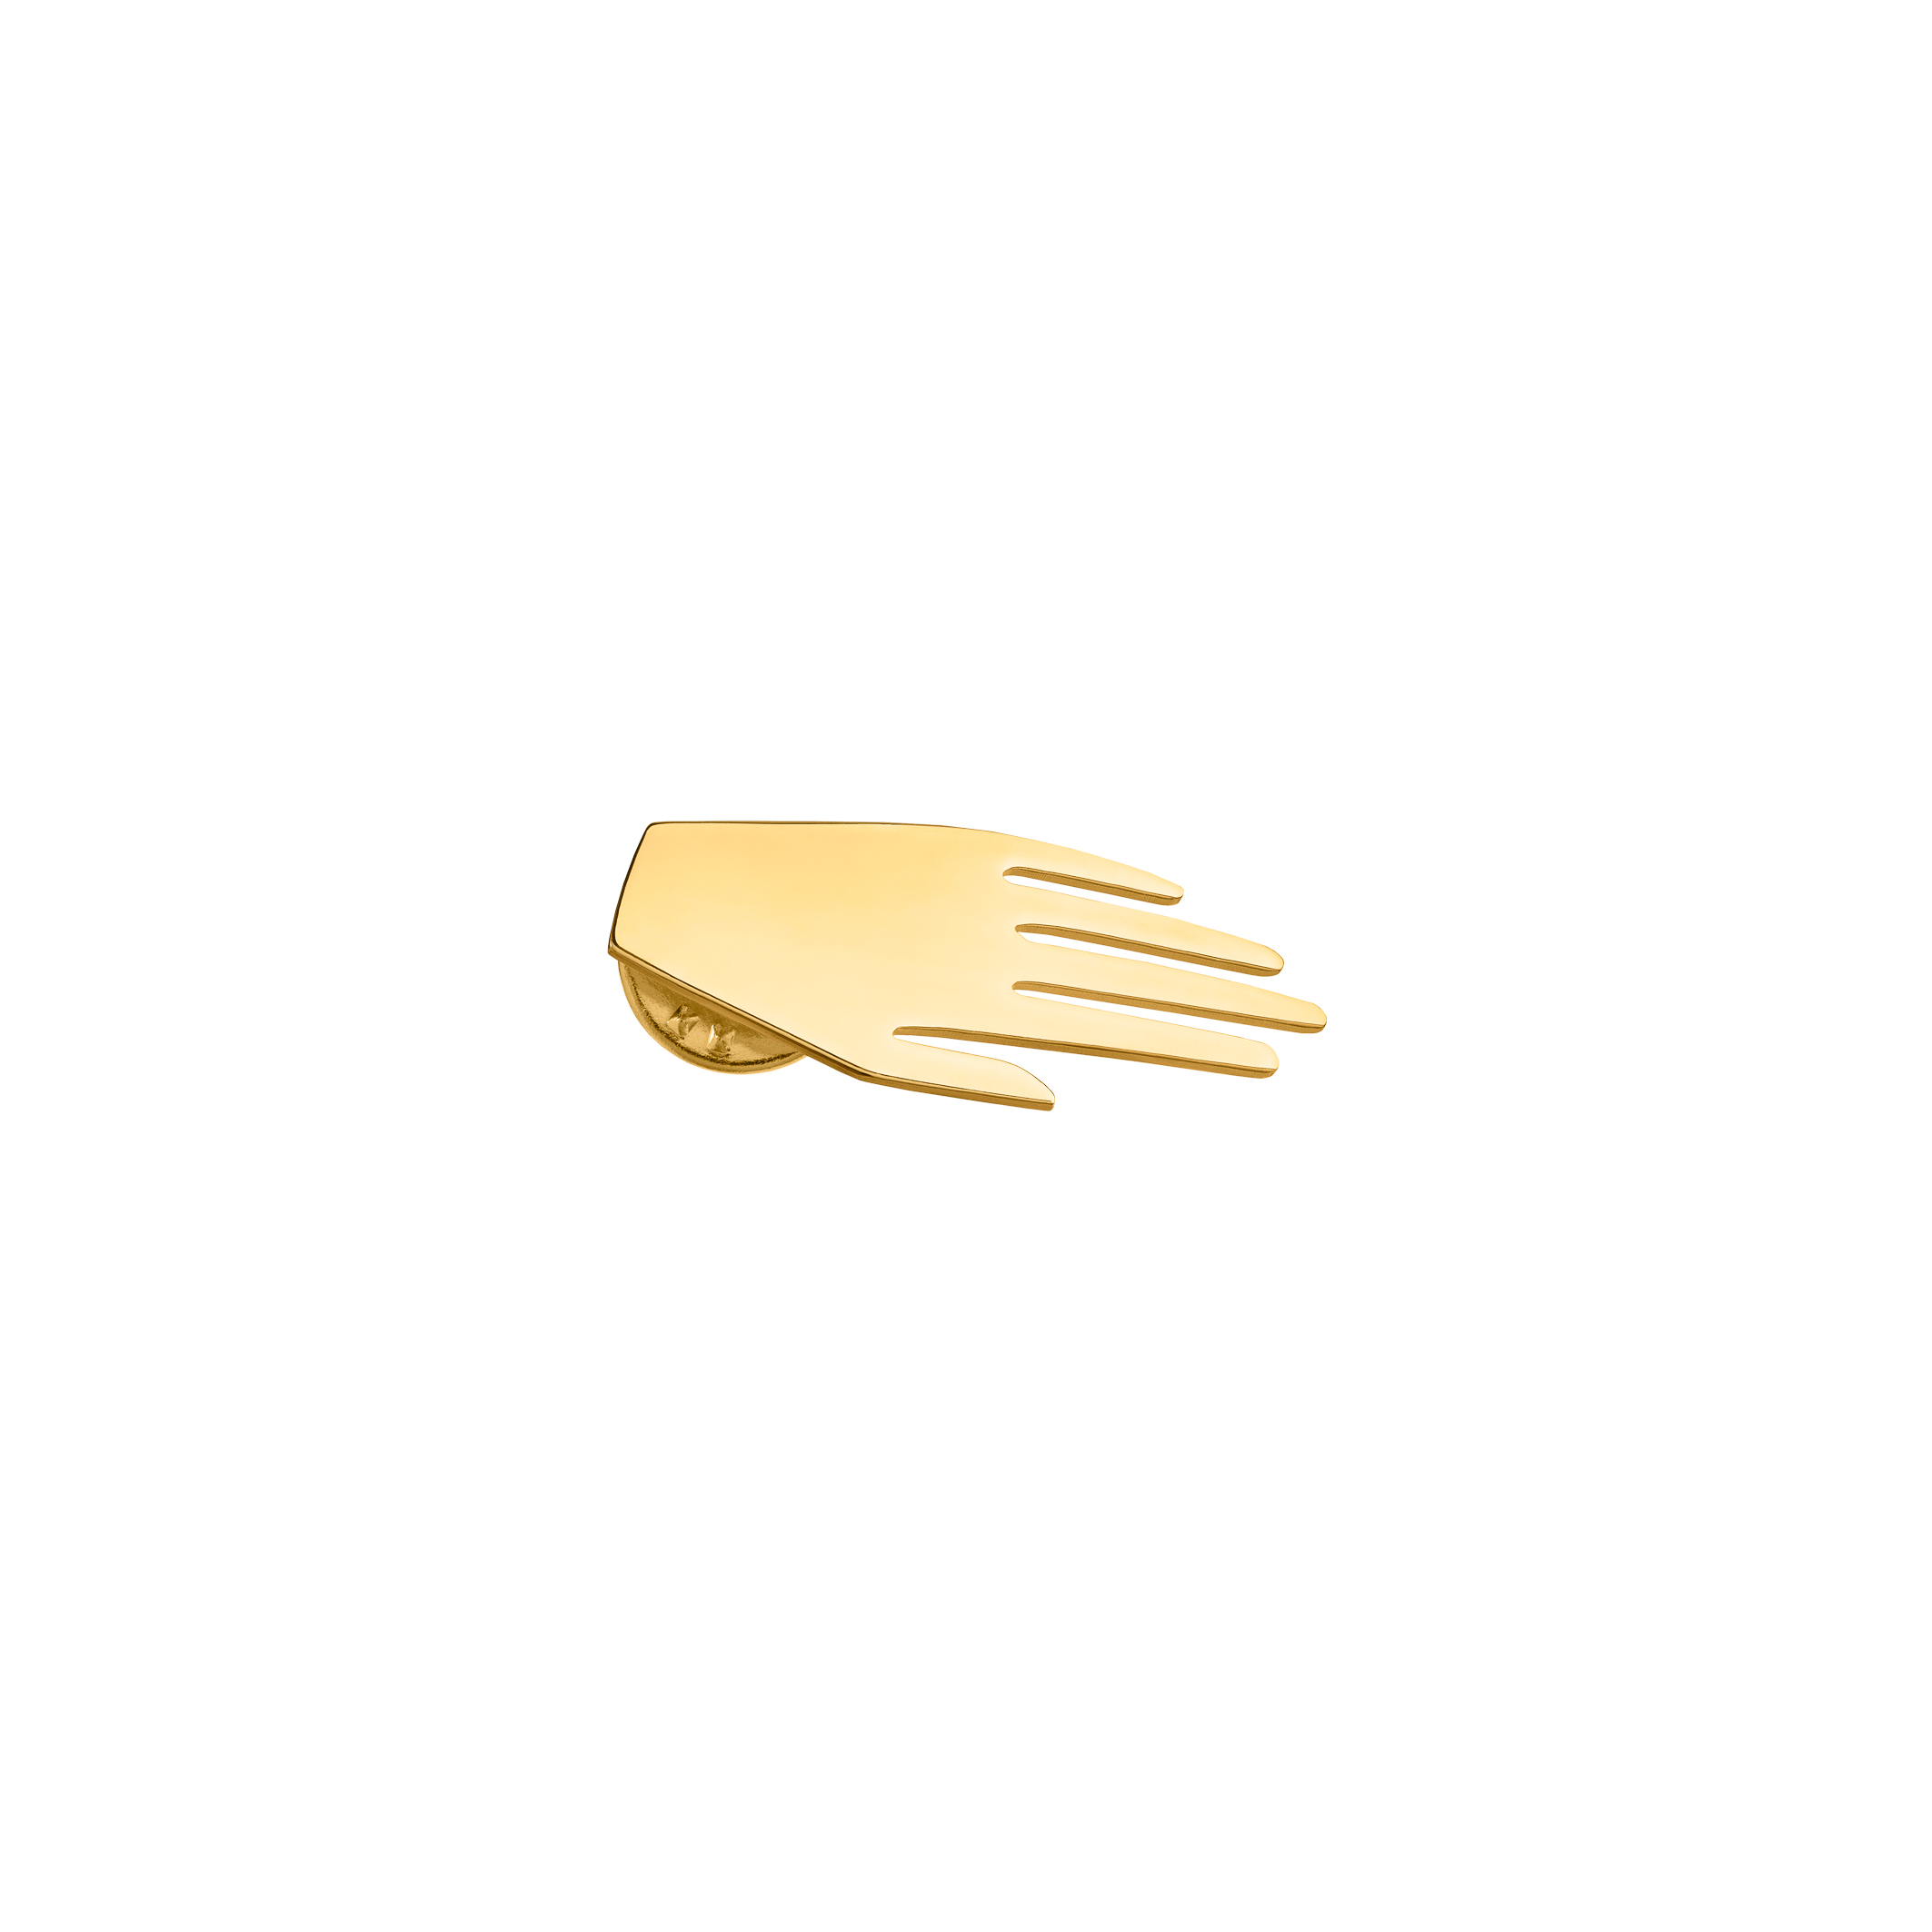 HAND PIN- GOLD